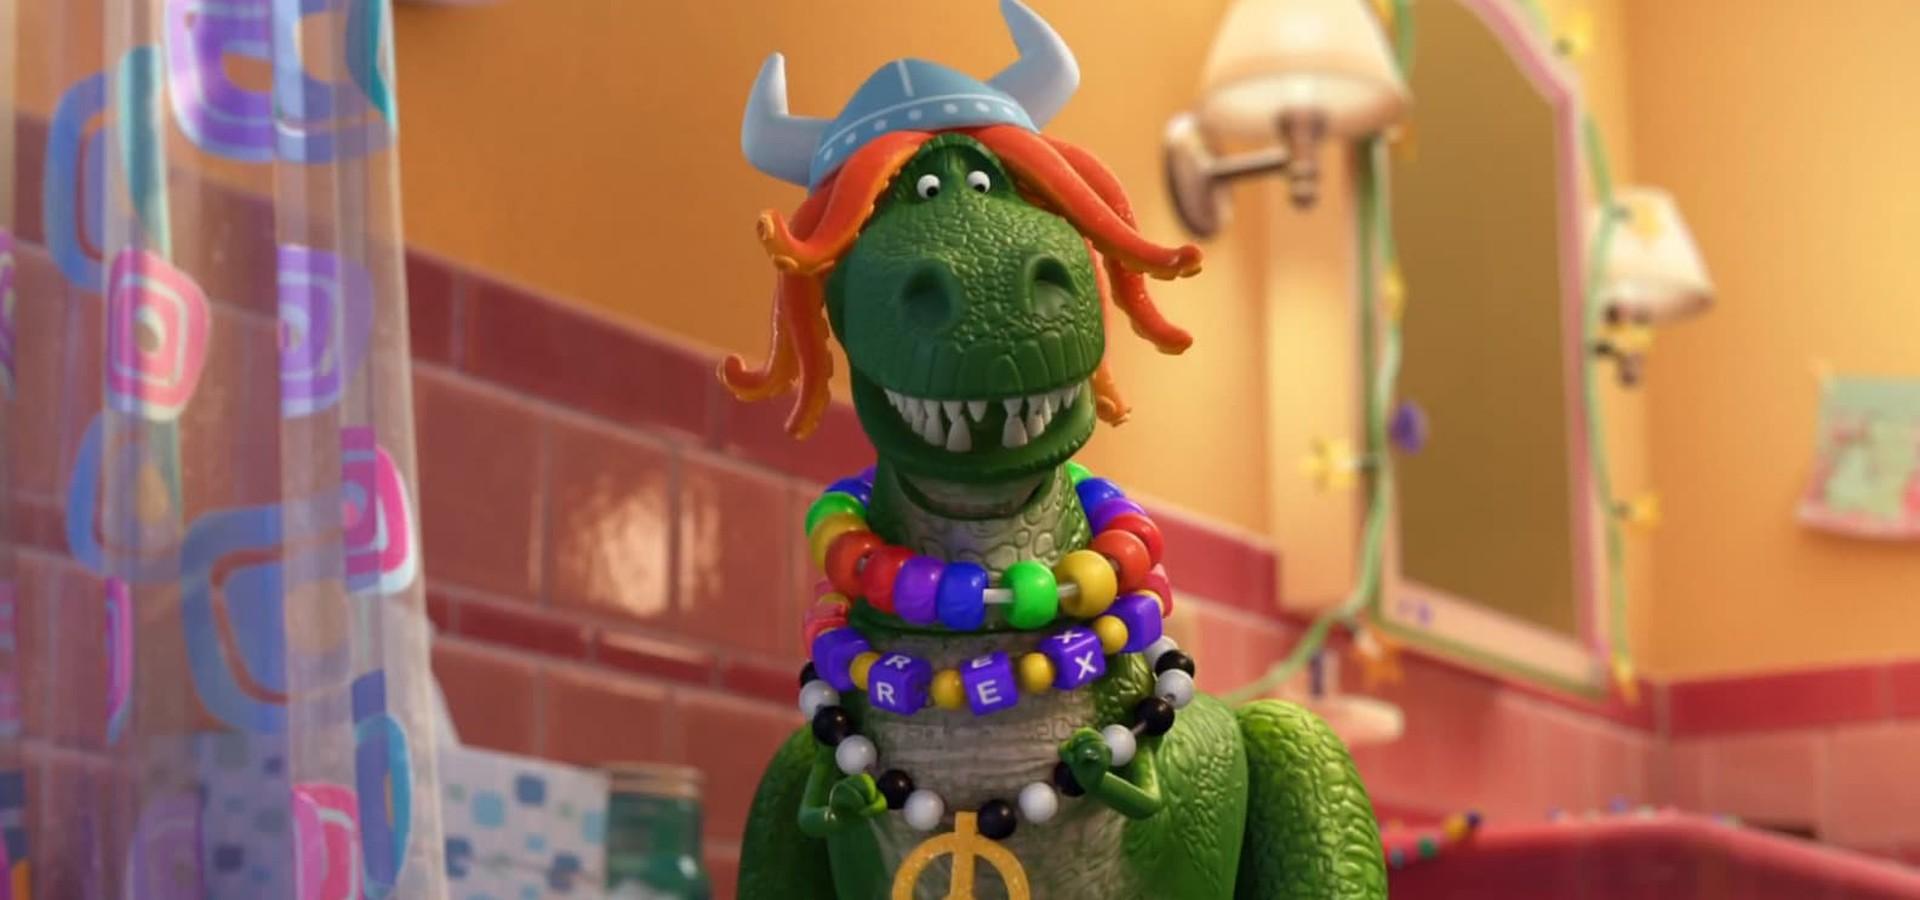 Toy Story – Rex Festasauros